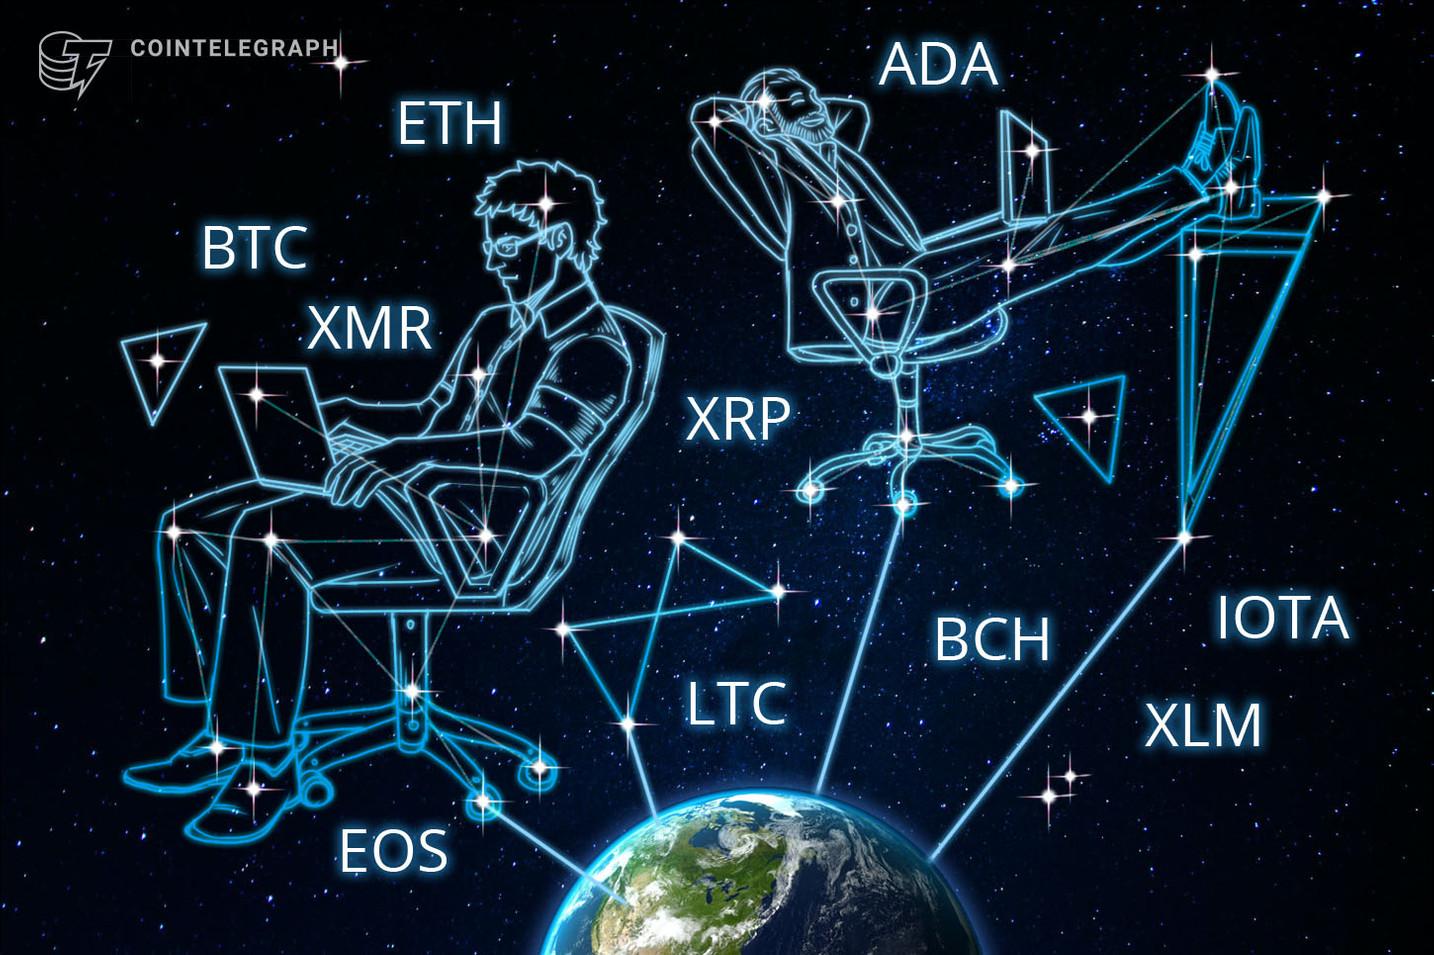 Bitcoin, Ethereum, Ripple, Bitcoin Cash, EOS, Stellar, Litecoin, Cardano, Monero, IOTA: Analisi dei prezzi, 20 agosto